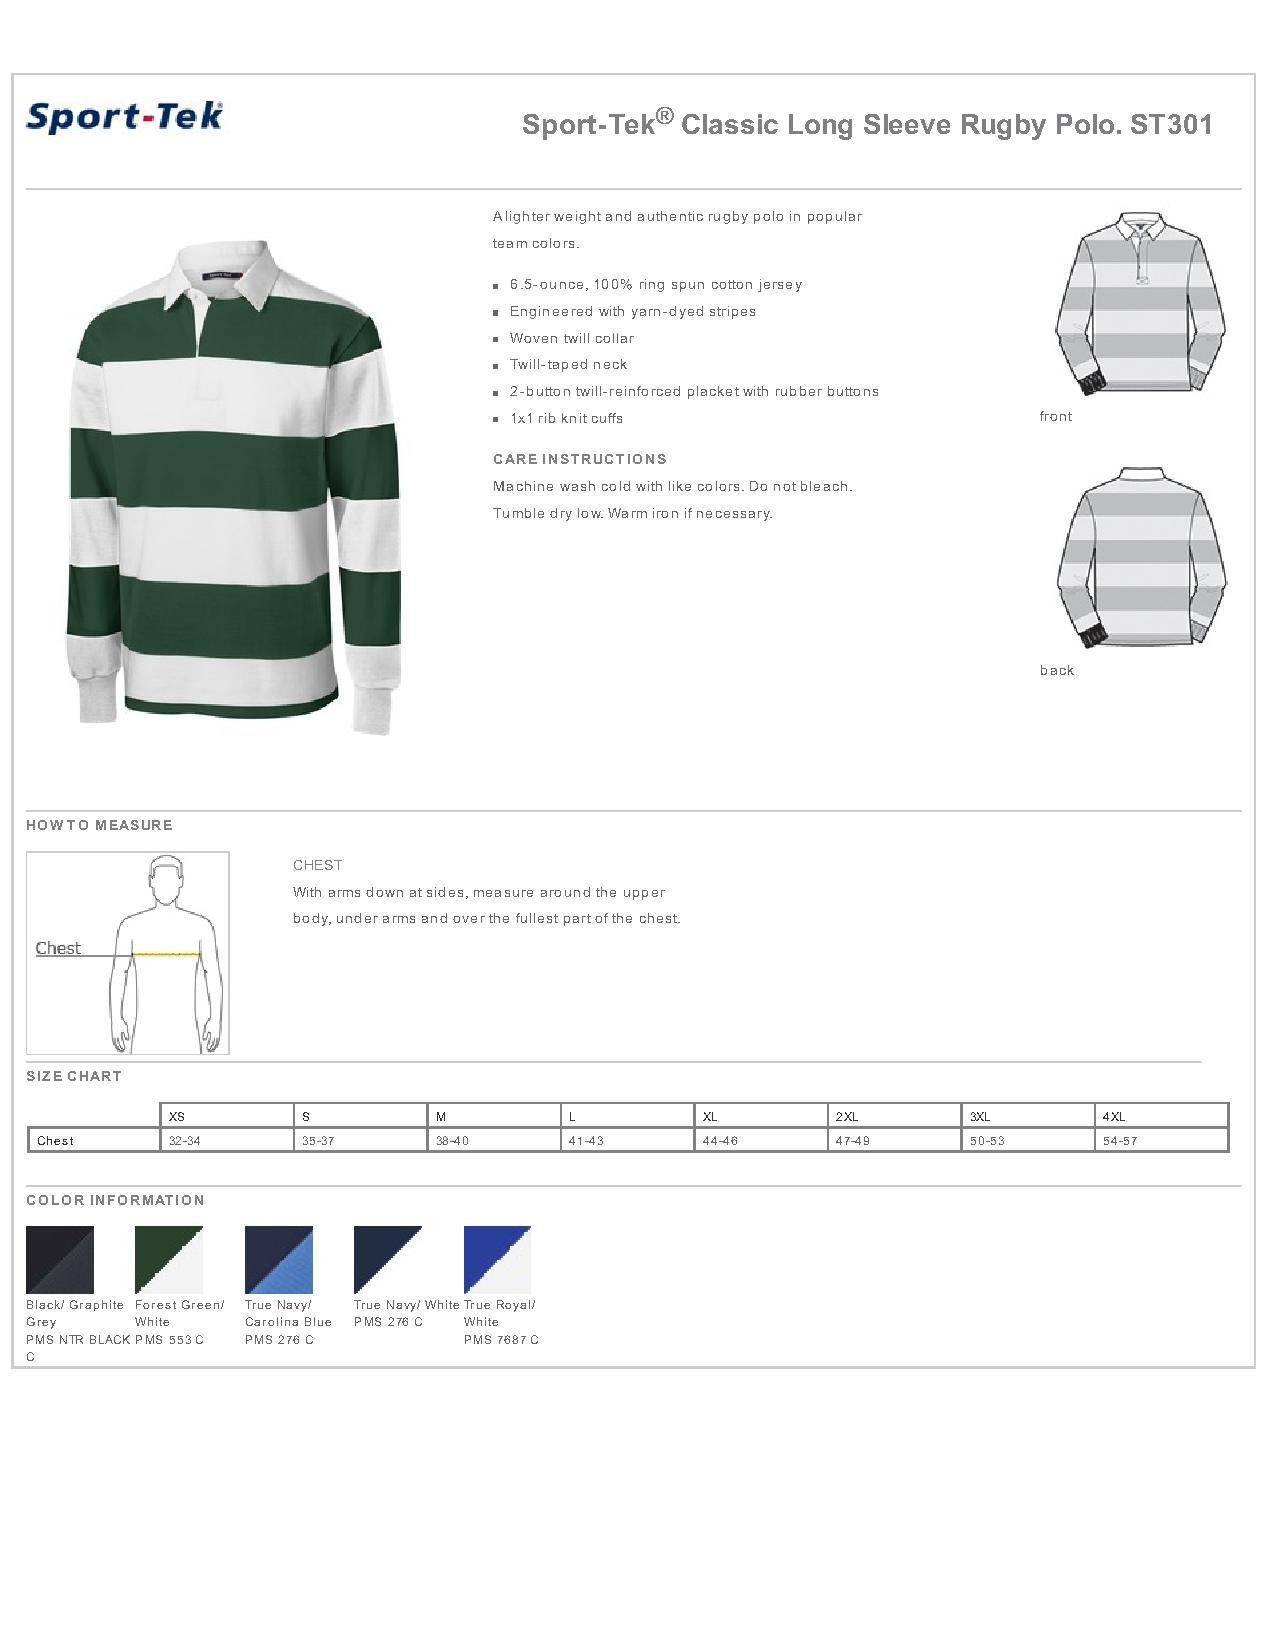 b62632e690c Sport-Tek ST301 - Classic Long Sleeve Rugby Polo $26.48 - Men's Fleece